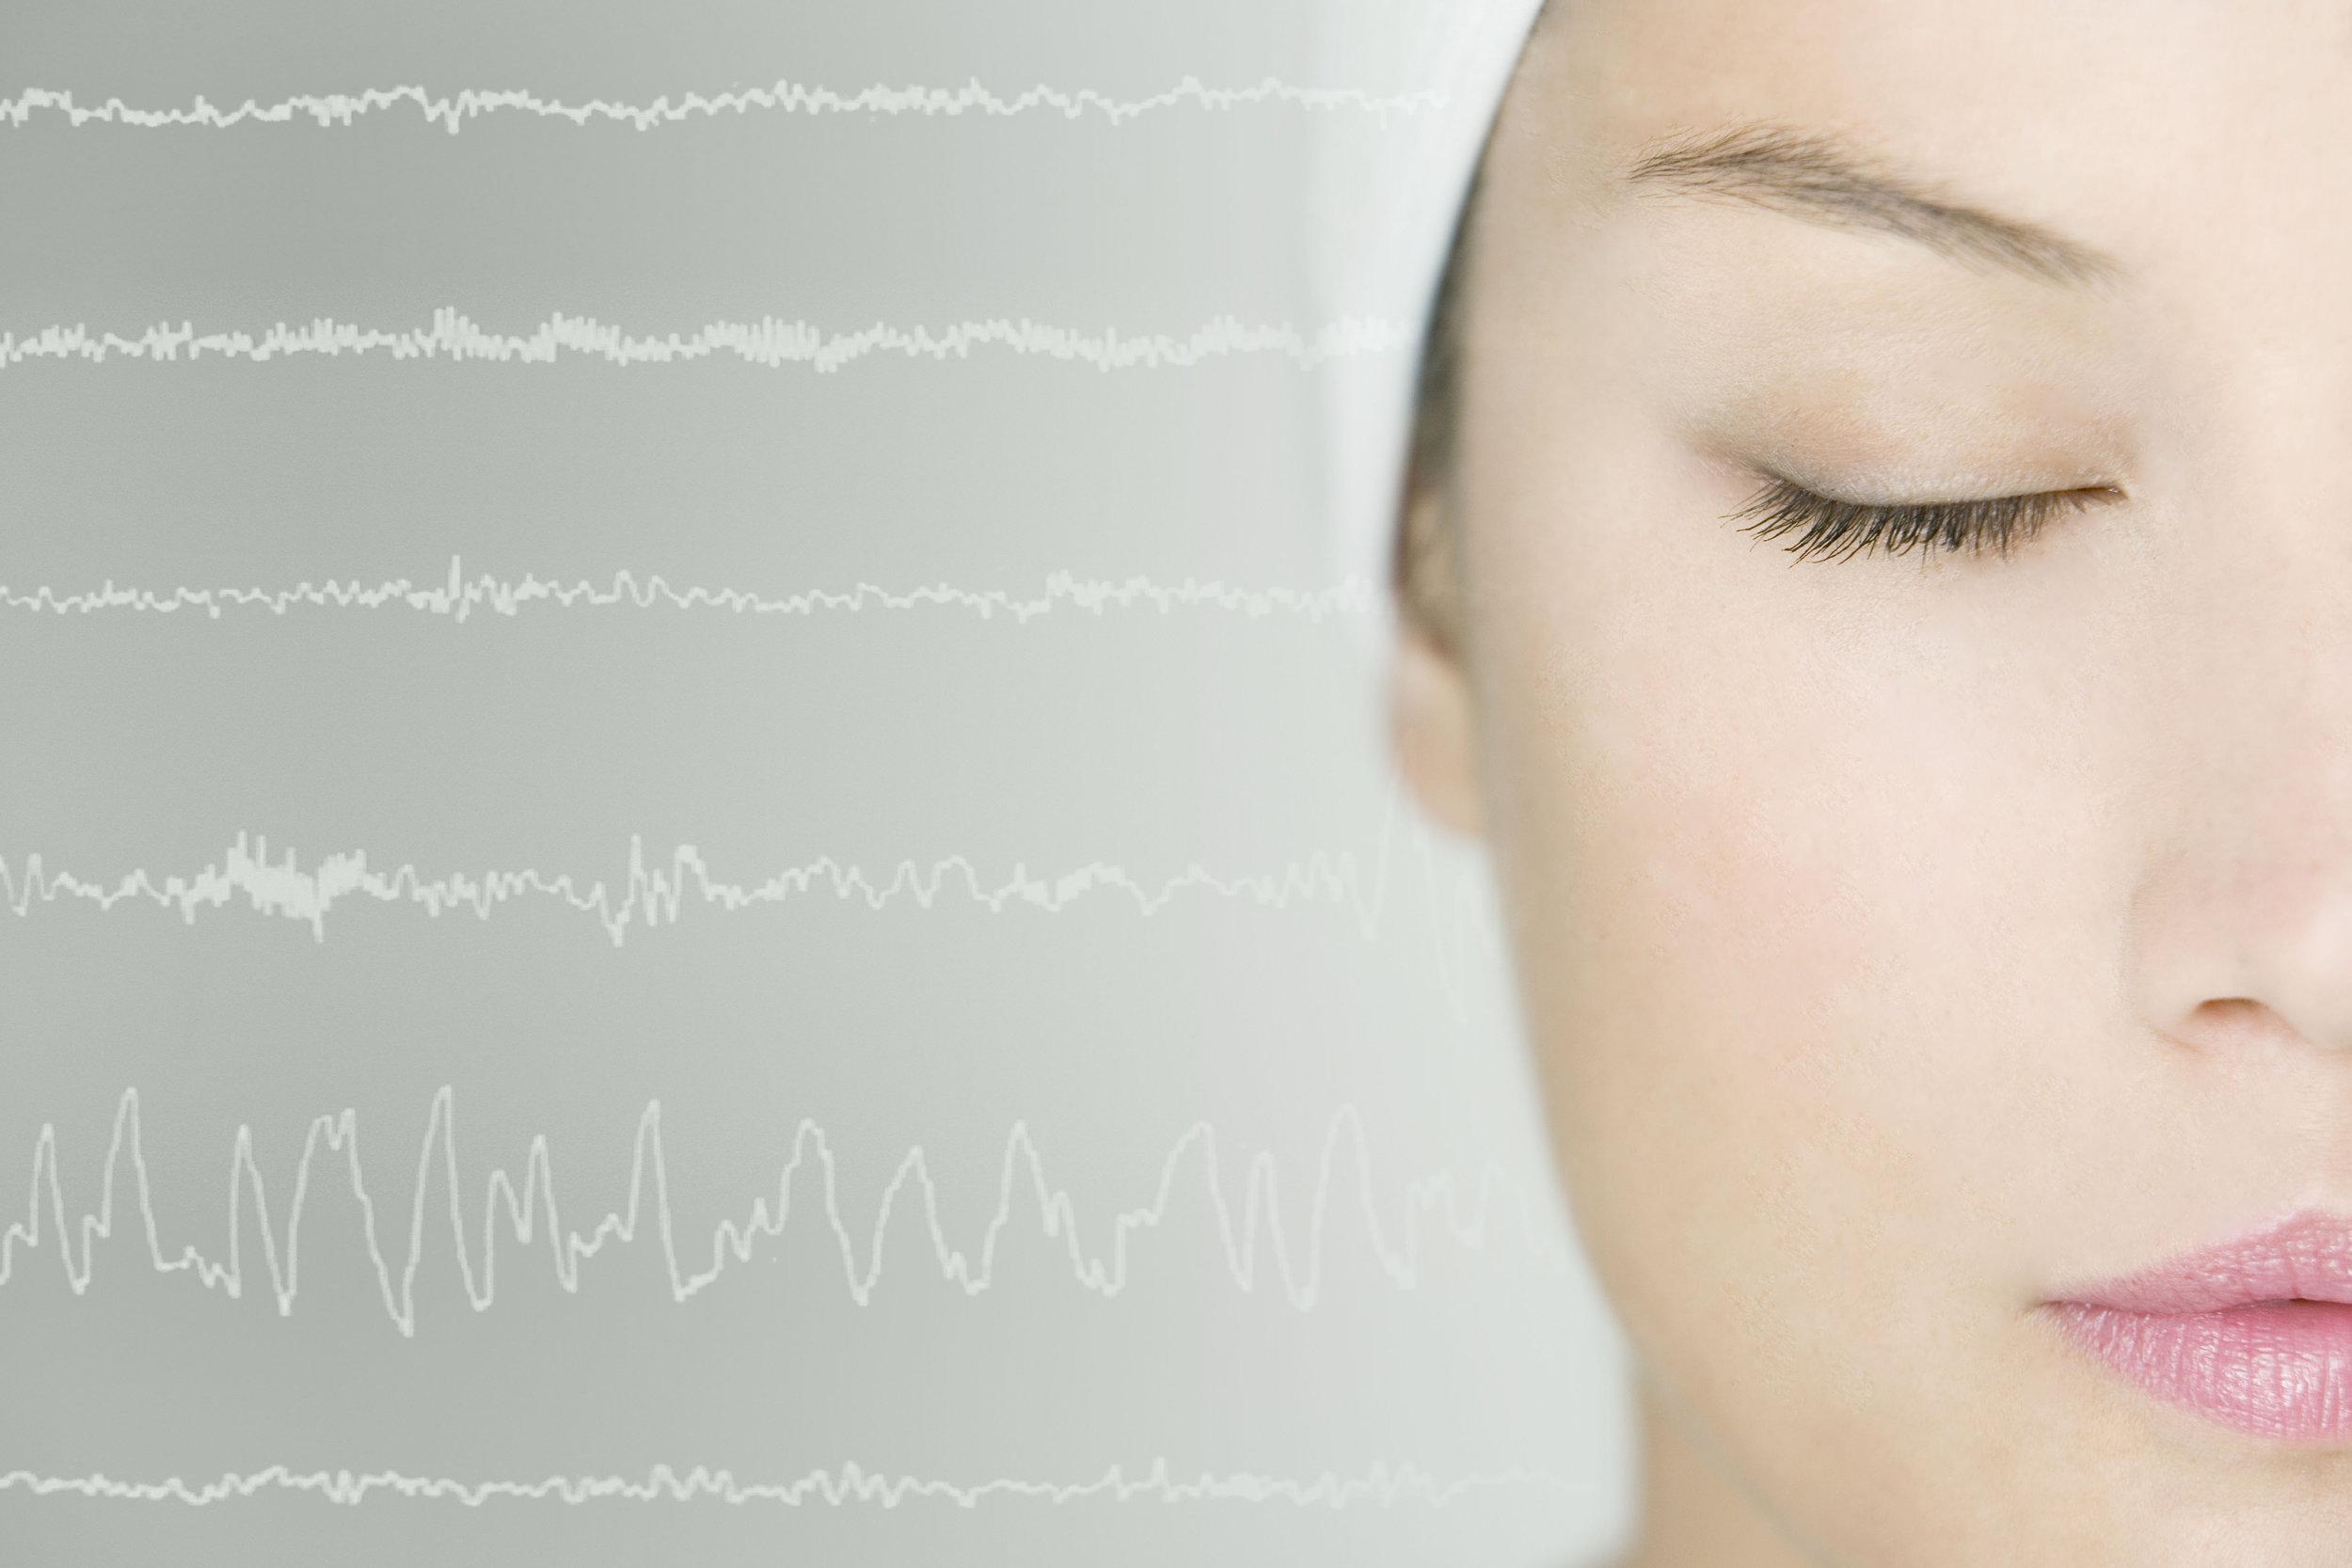 LORETA relates surface EEG data to activity in specific brain regions